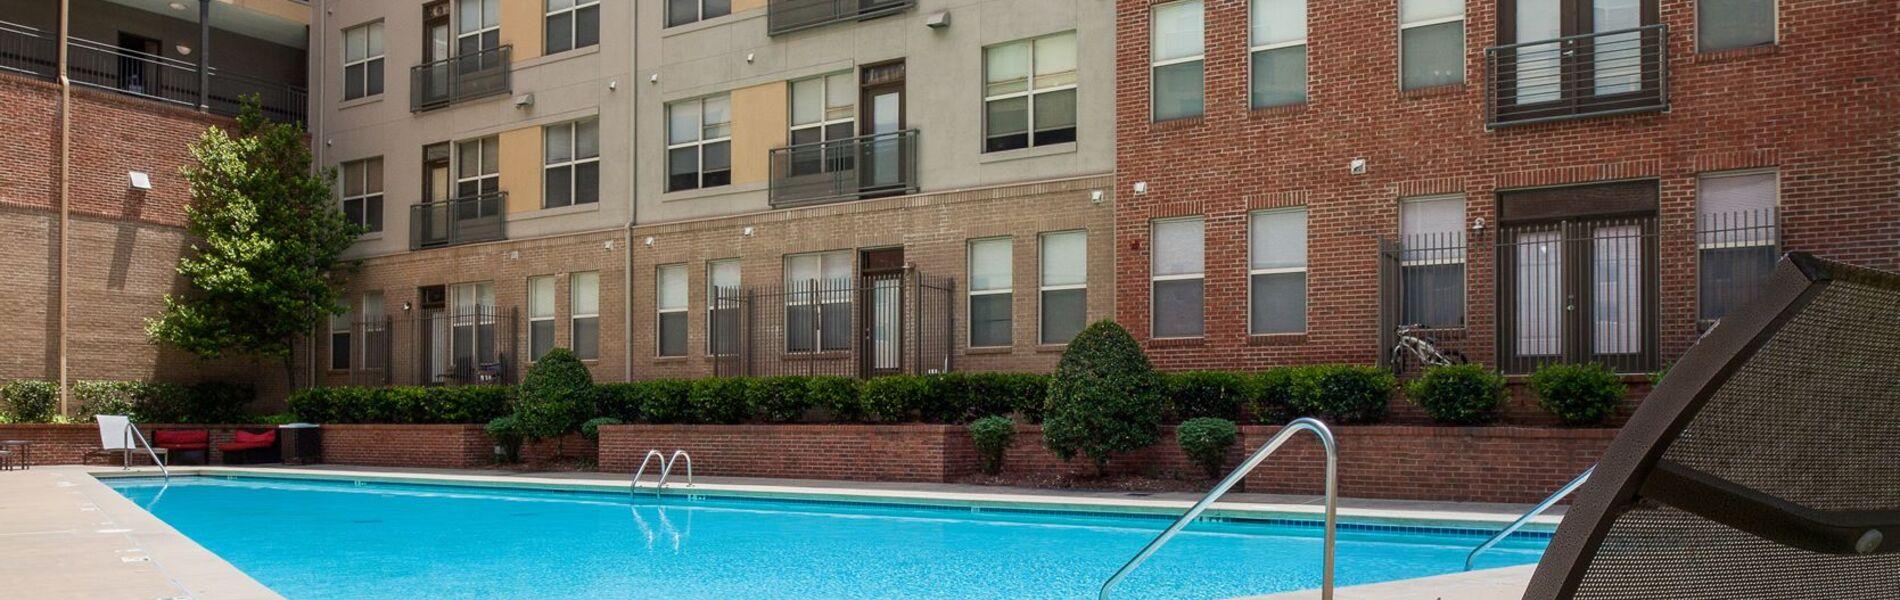 apartments for rent in atlanta ga auburn glenn home